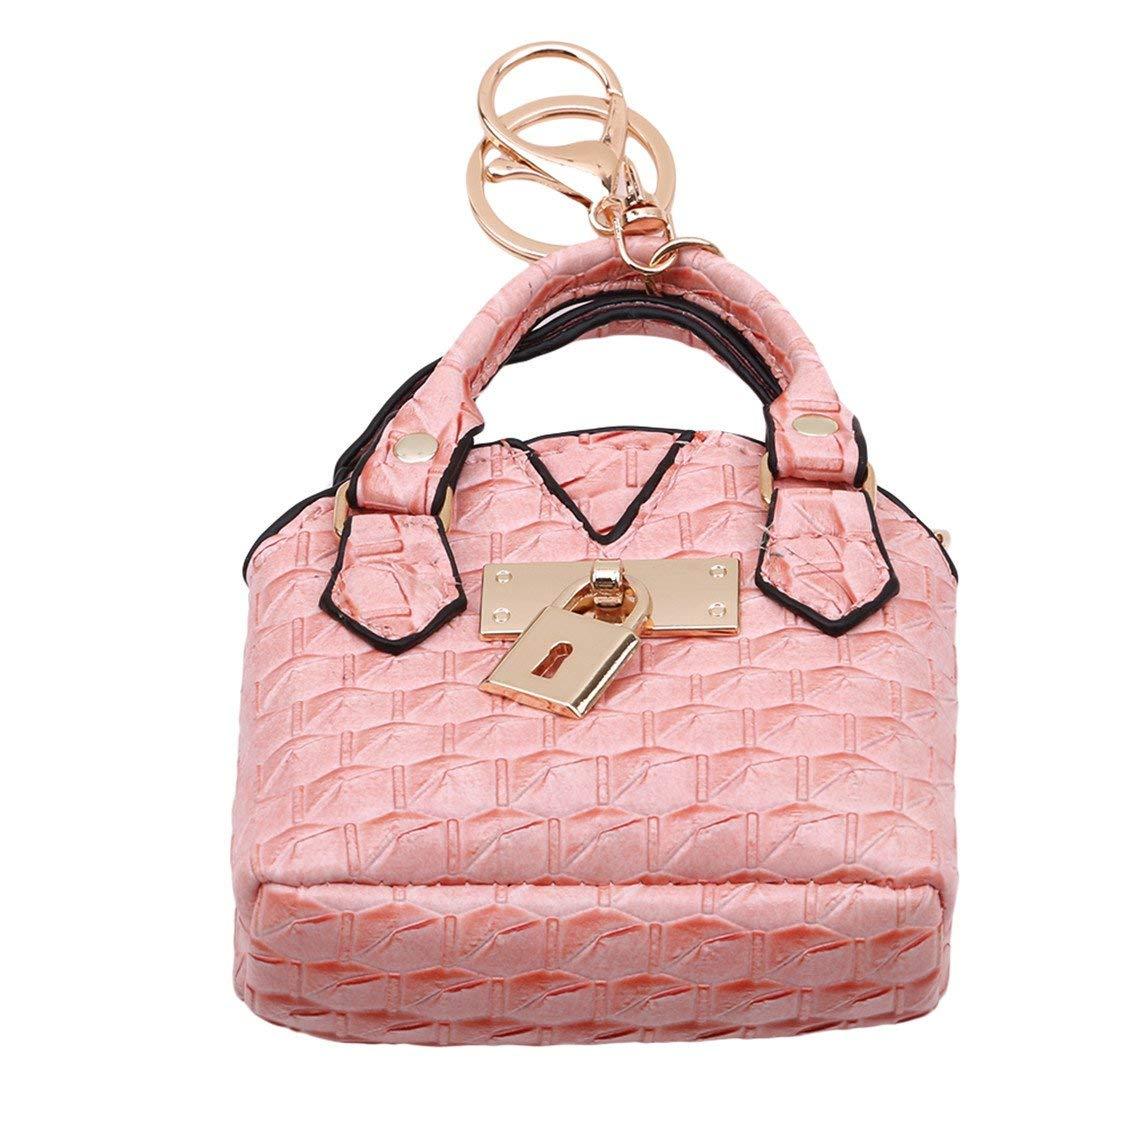 e3b8c6e1bd0c Rurah Women Clutch Coin Purse Mini Fashion Handbag Model Coin Purse Women  Clutch Change Purse